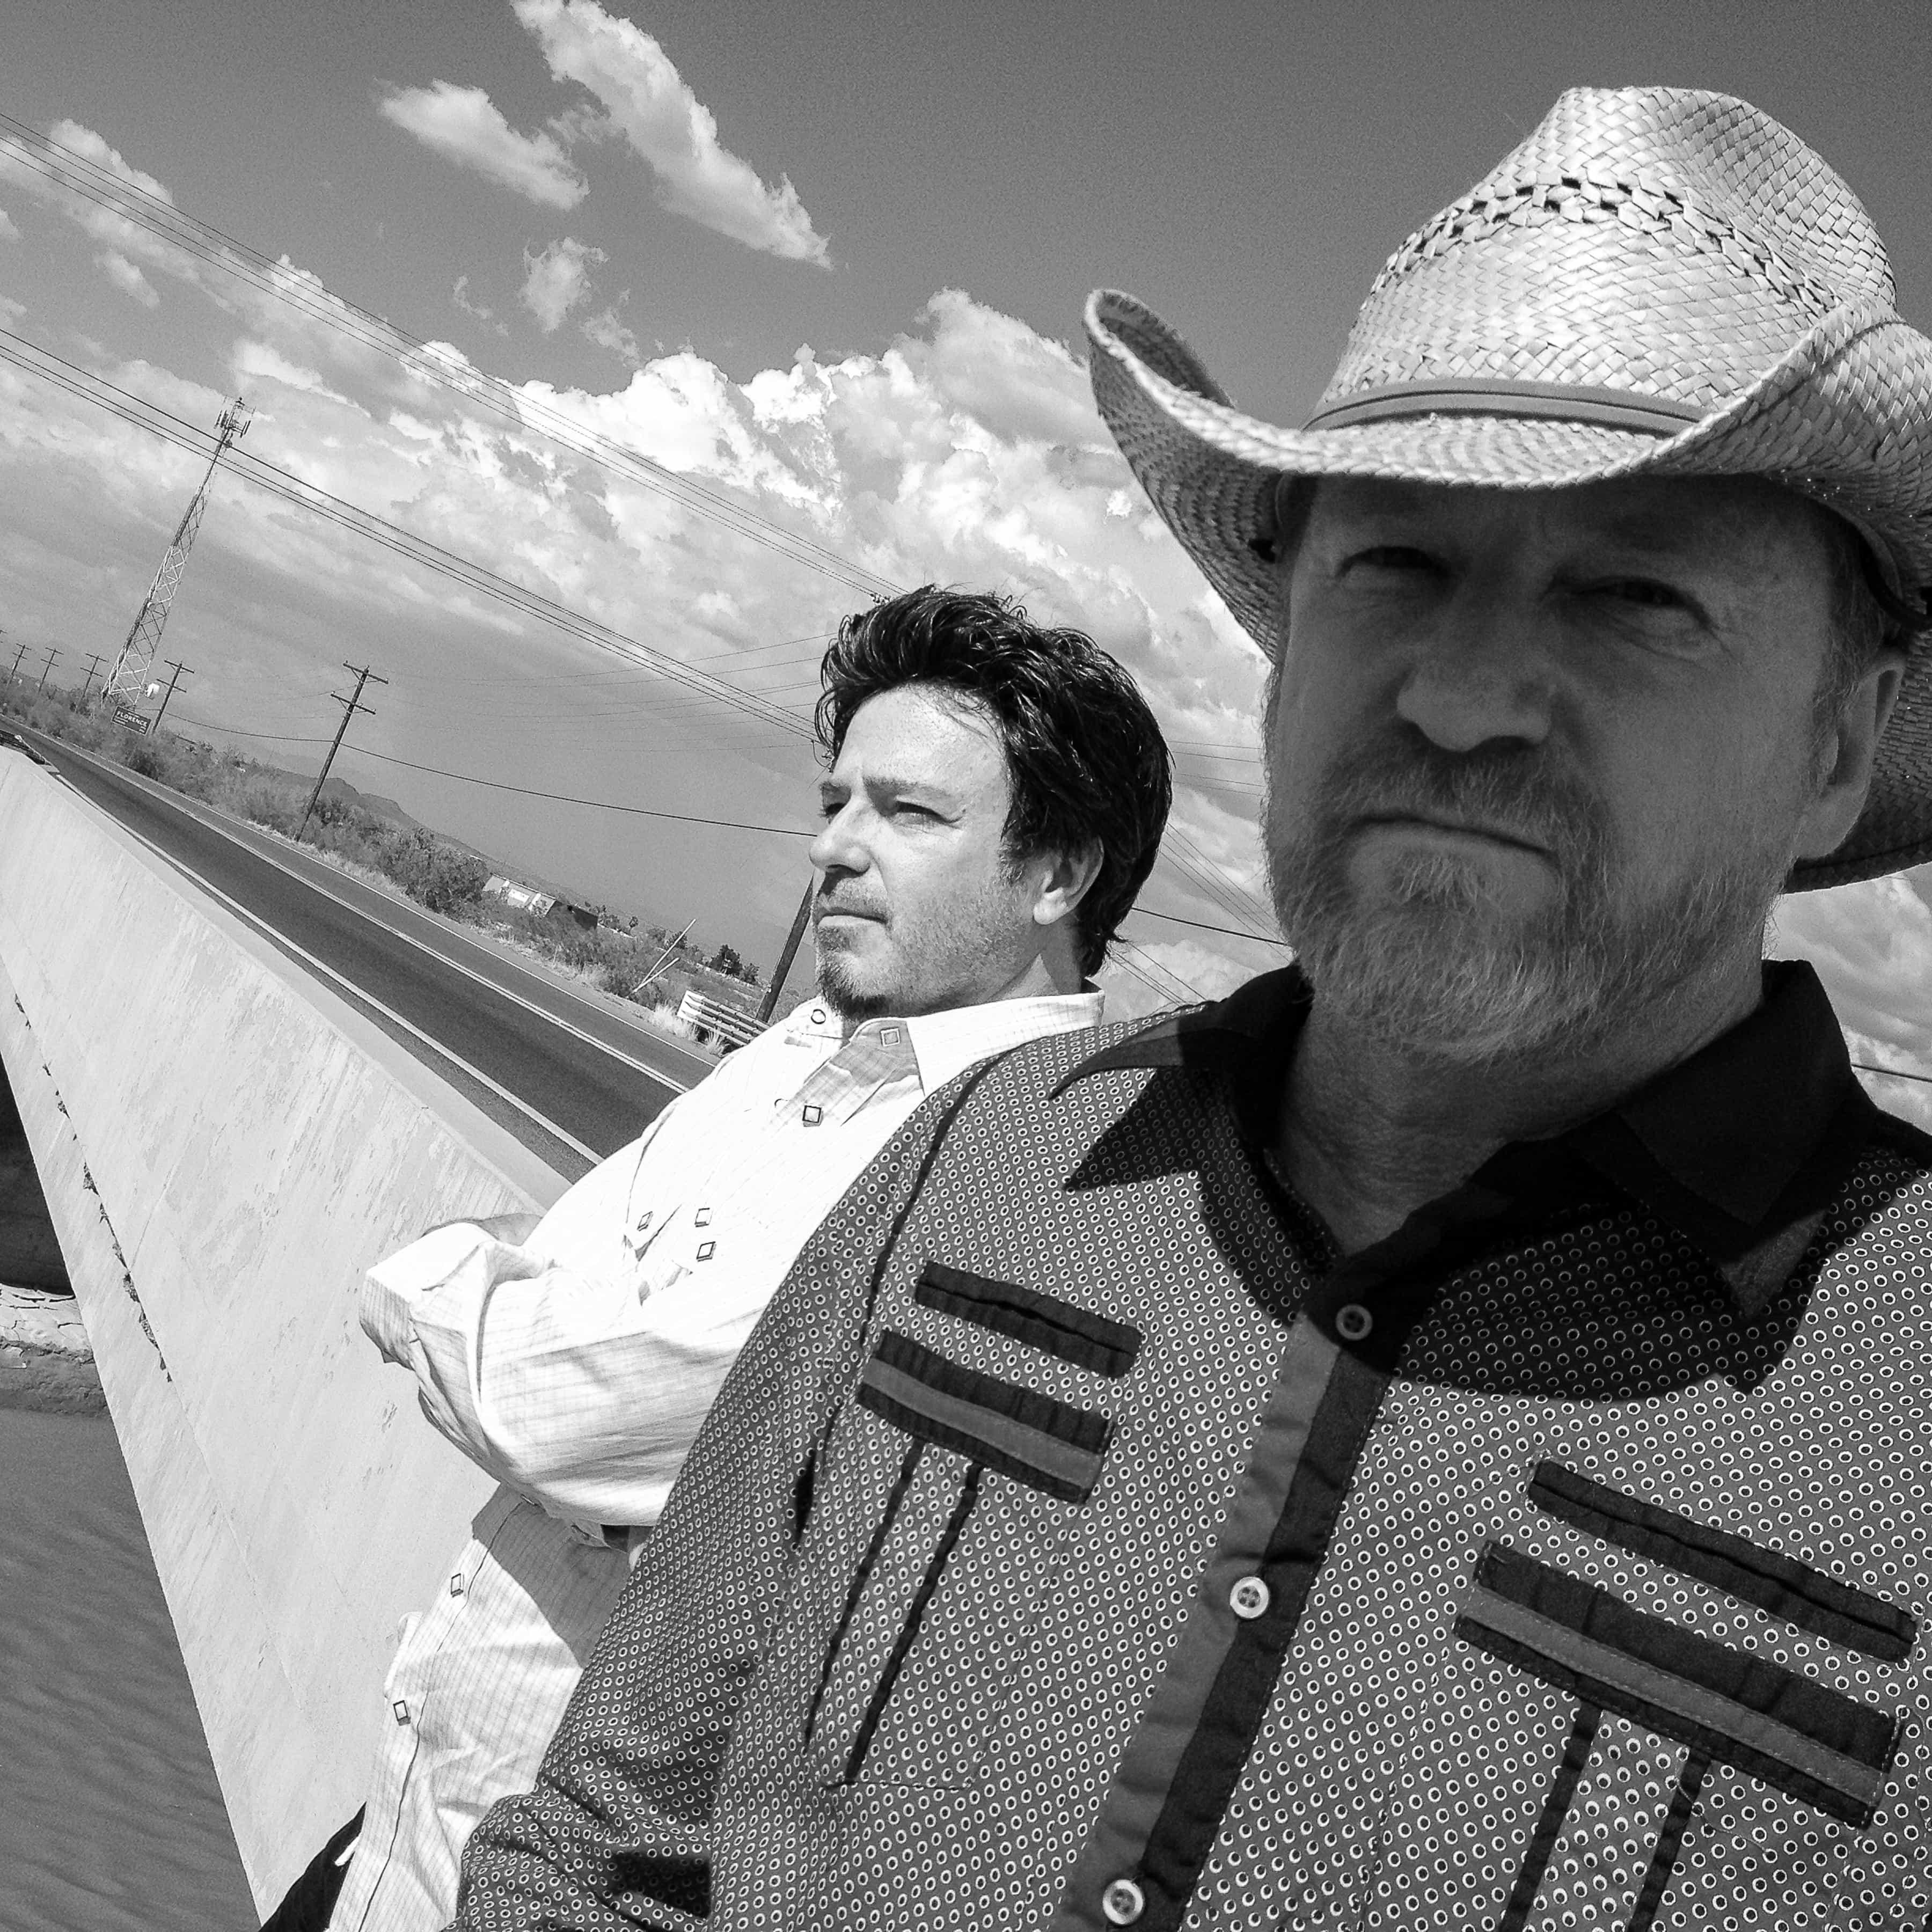 David Lowery (front) with Cracker bandmate Johnny Hickman. Photo by Bradford Jones.